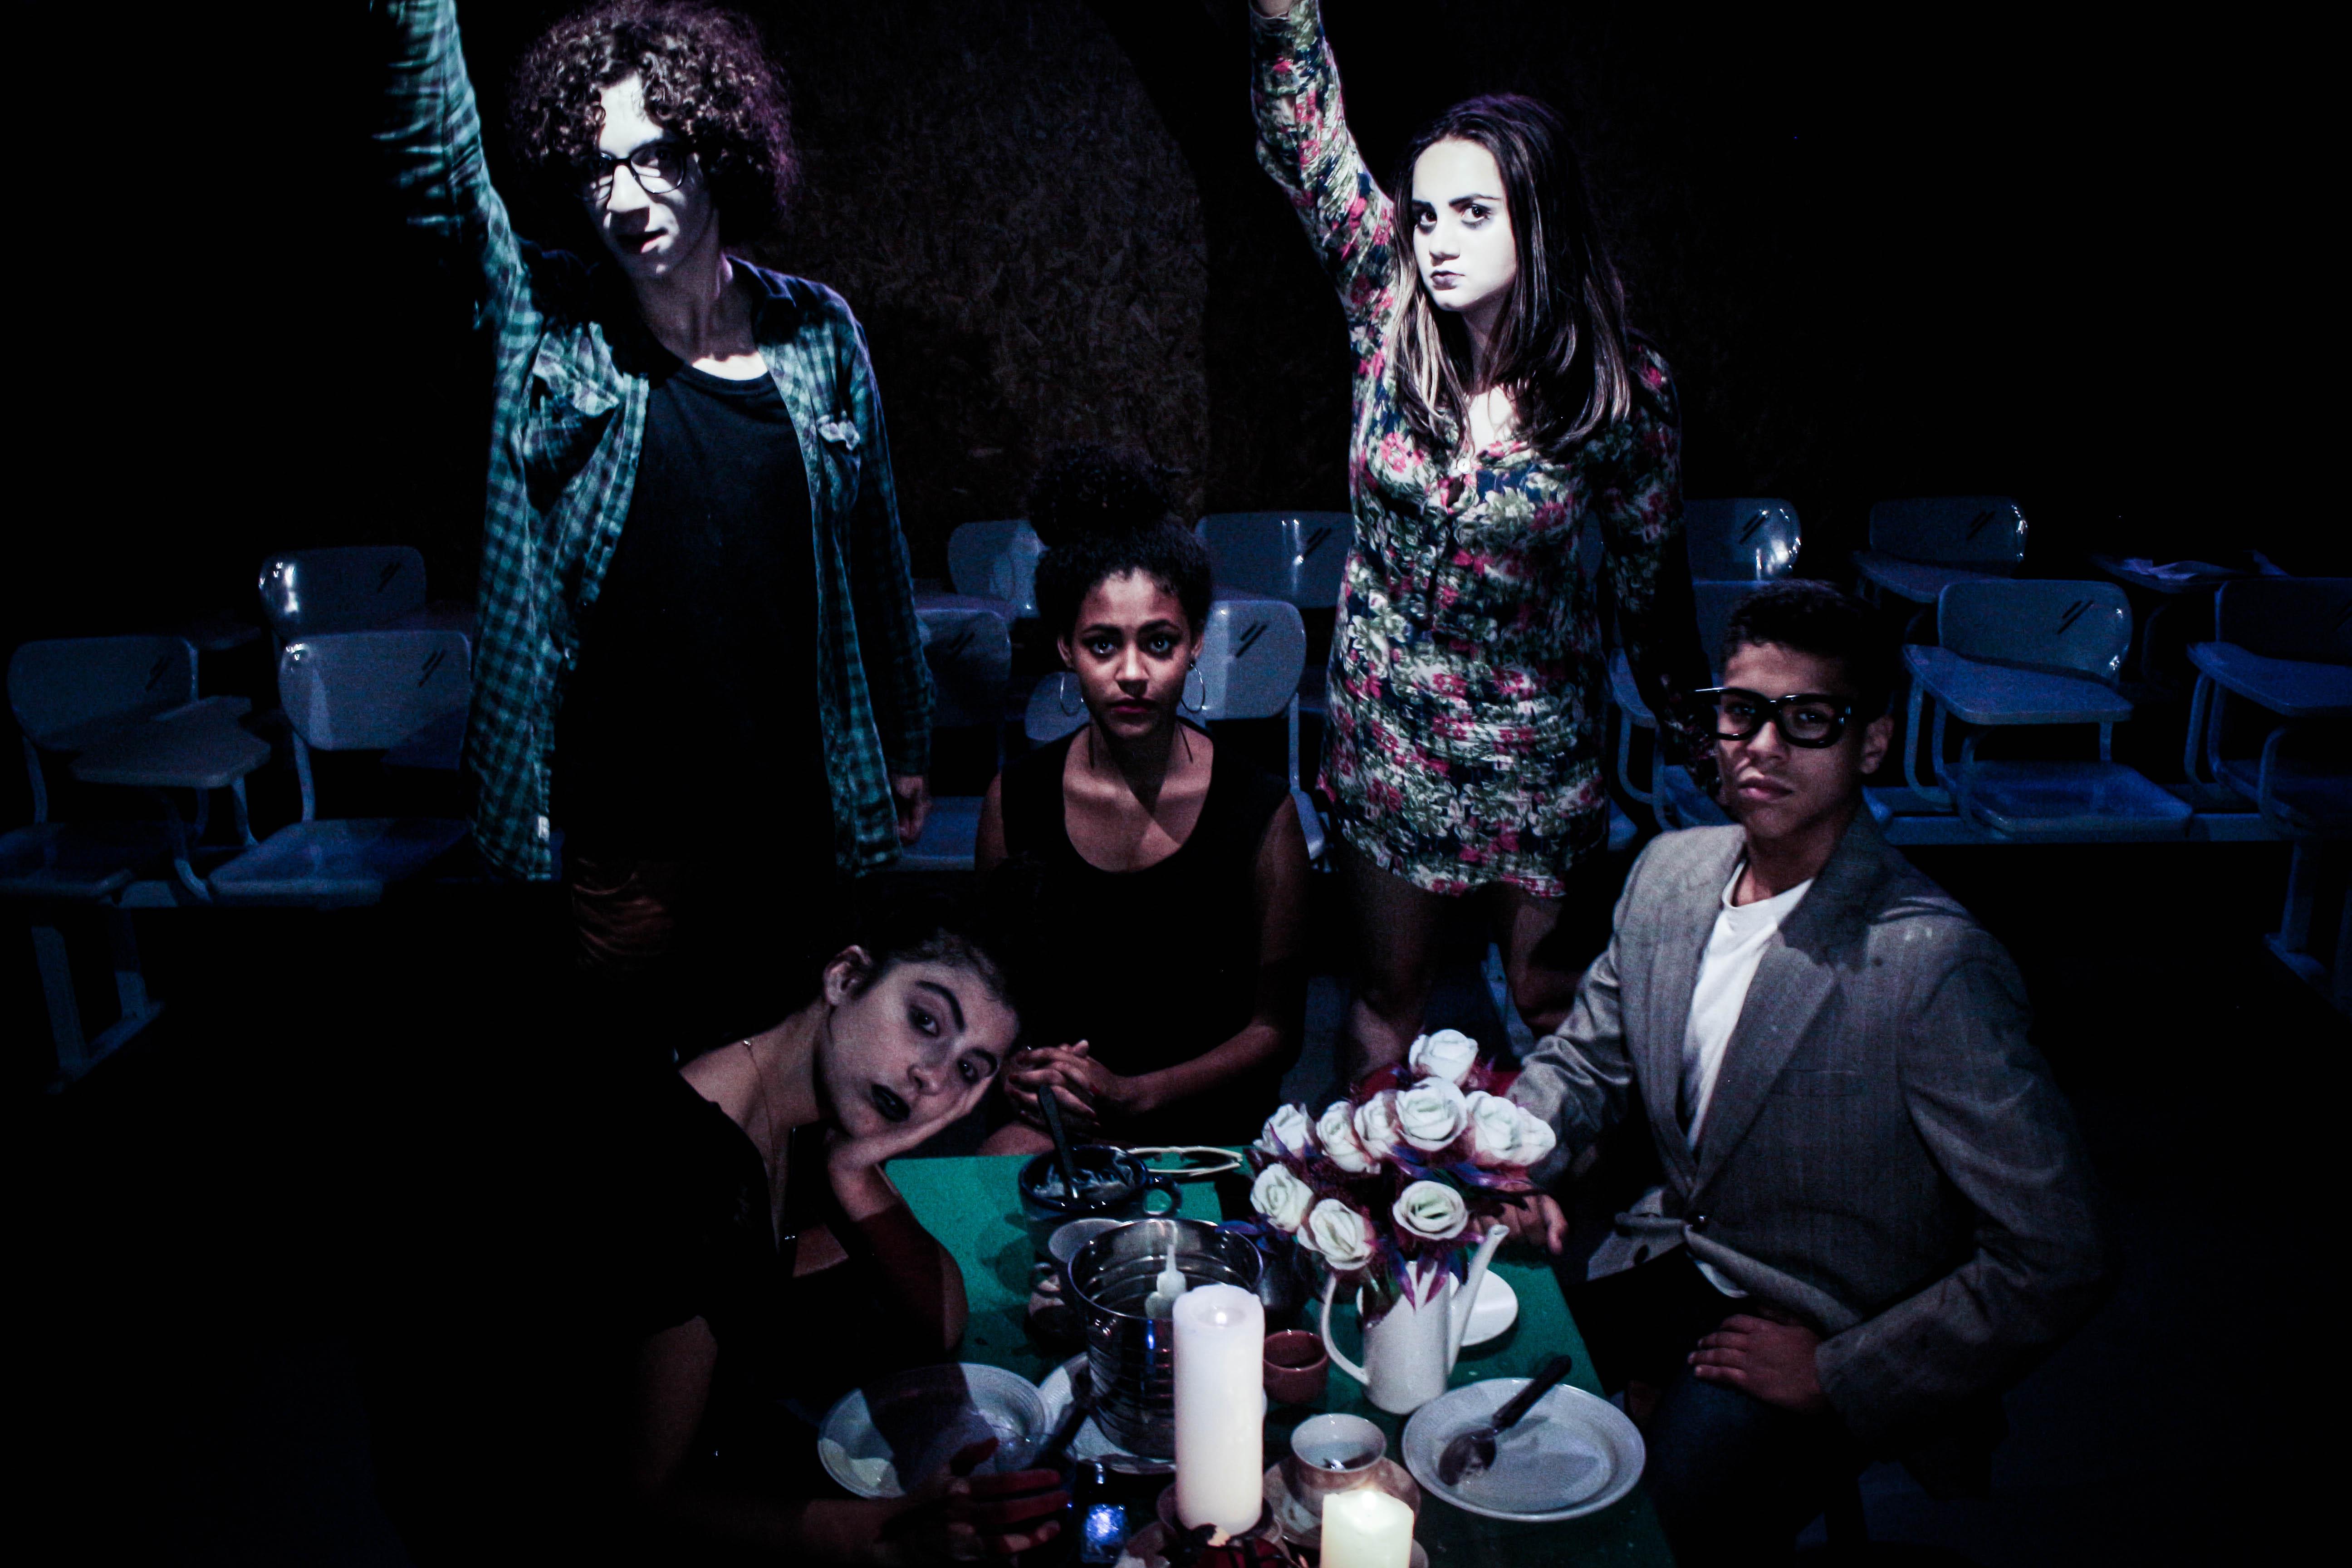 Os fantasmas assombram a família Deets